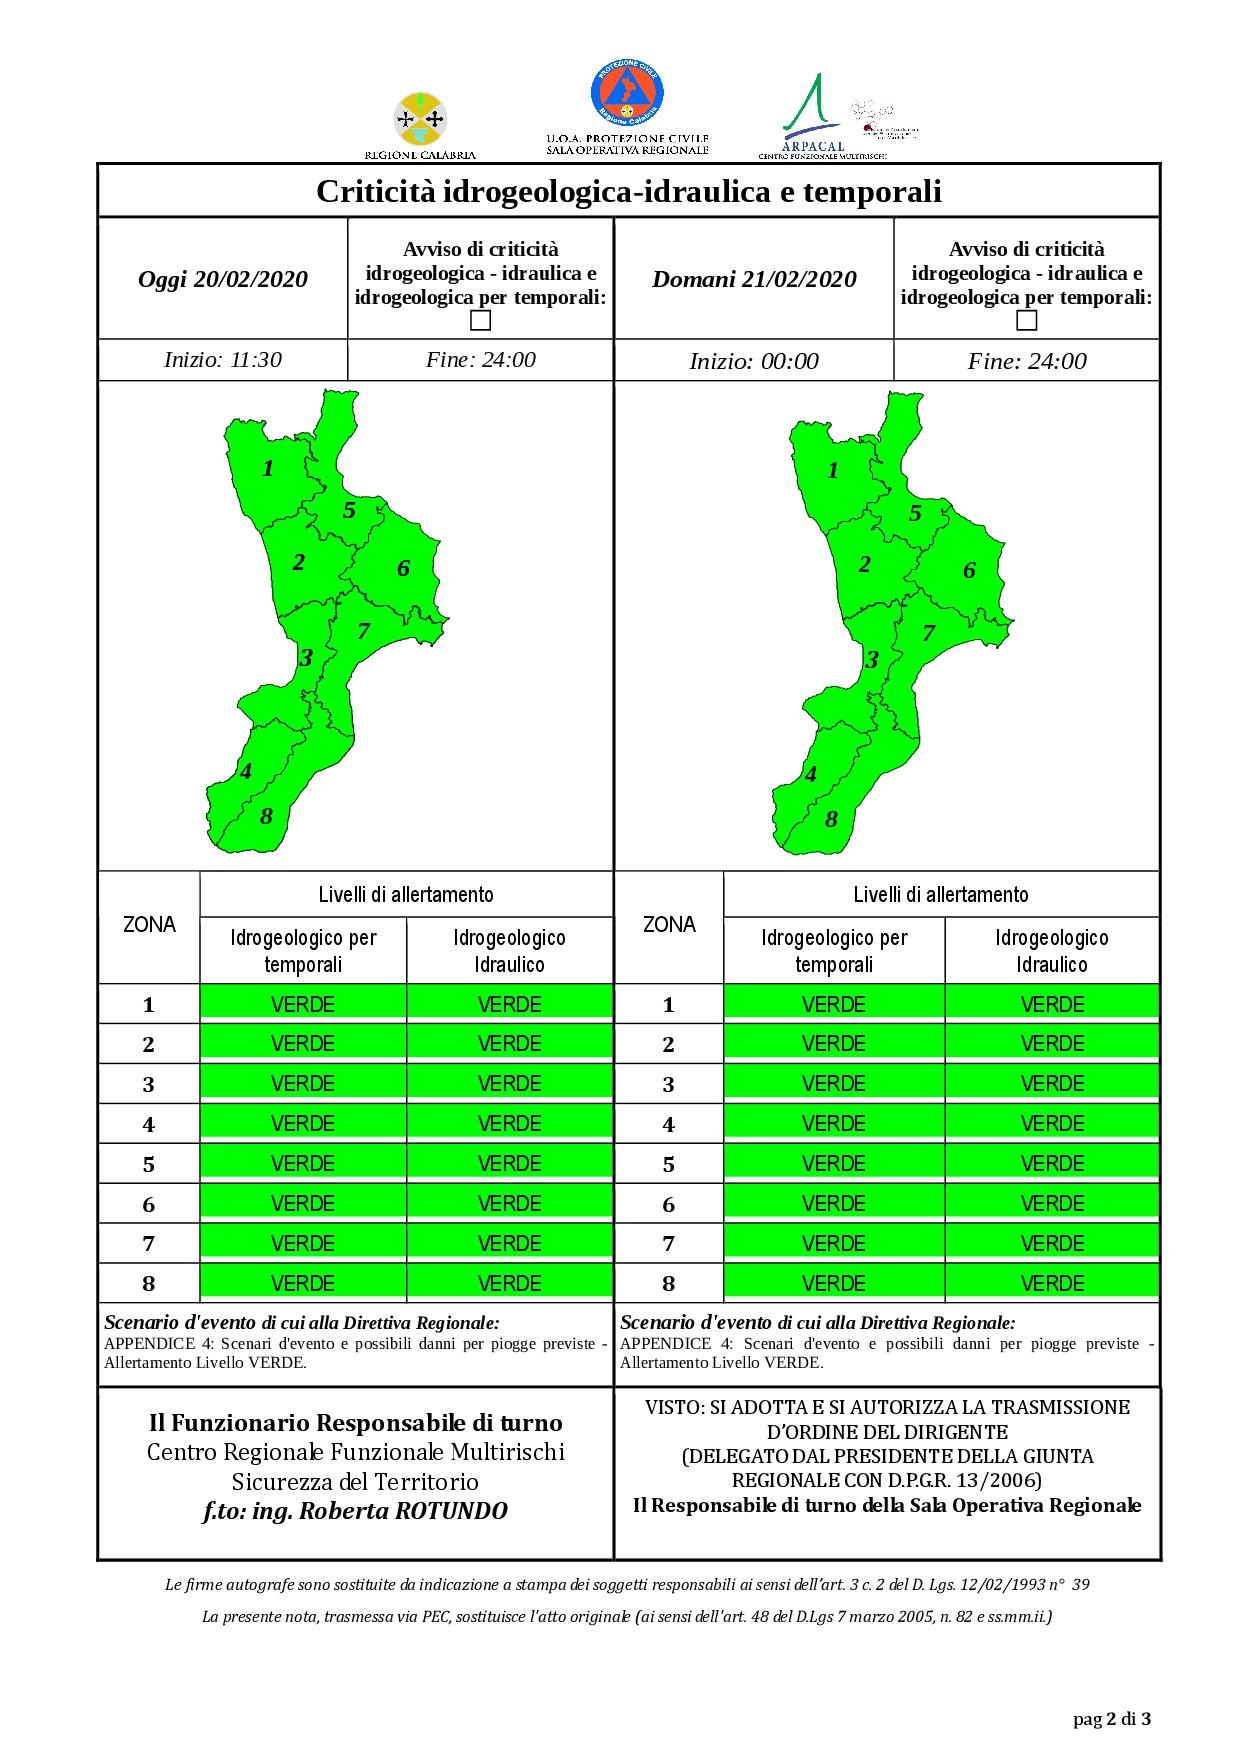 Criticità idrogeologica-idraulica e temporali in Calabria 20-02-2020